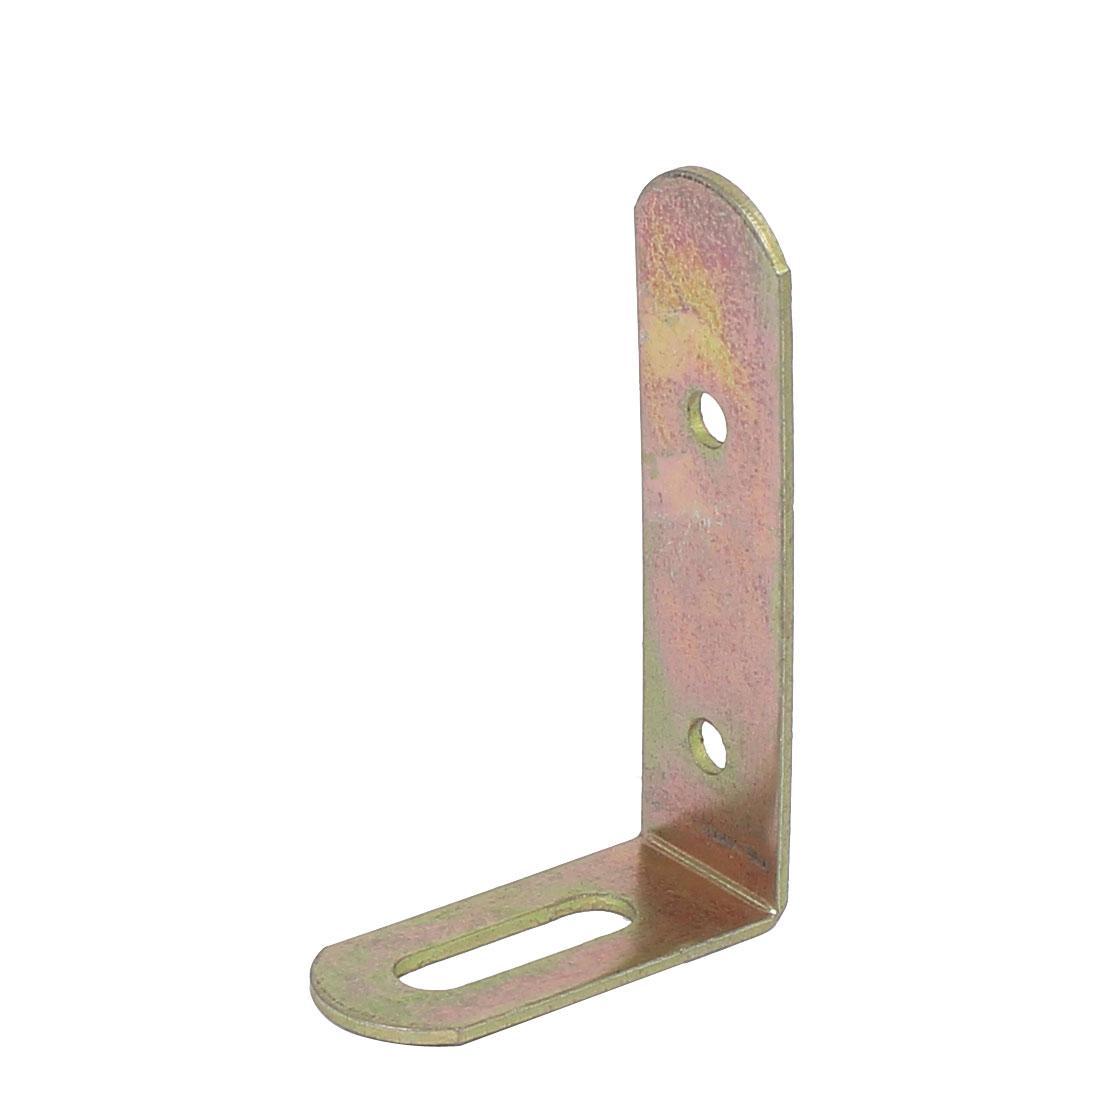 69mmx43mmx19mm L Shape Angle Bracket Corner Brace Fastener Bronze Tone